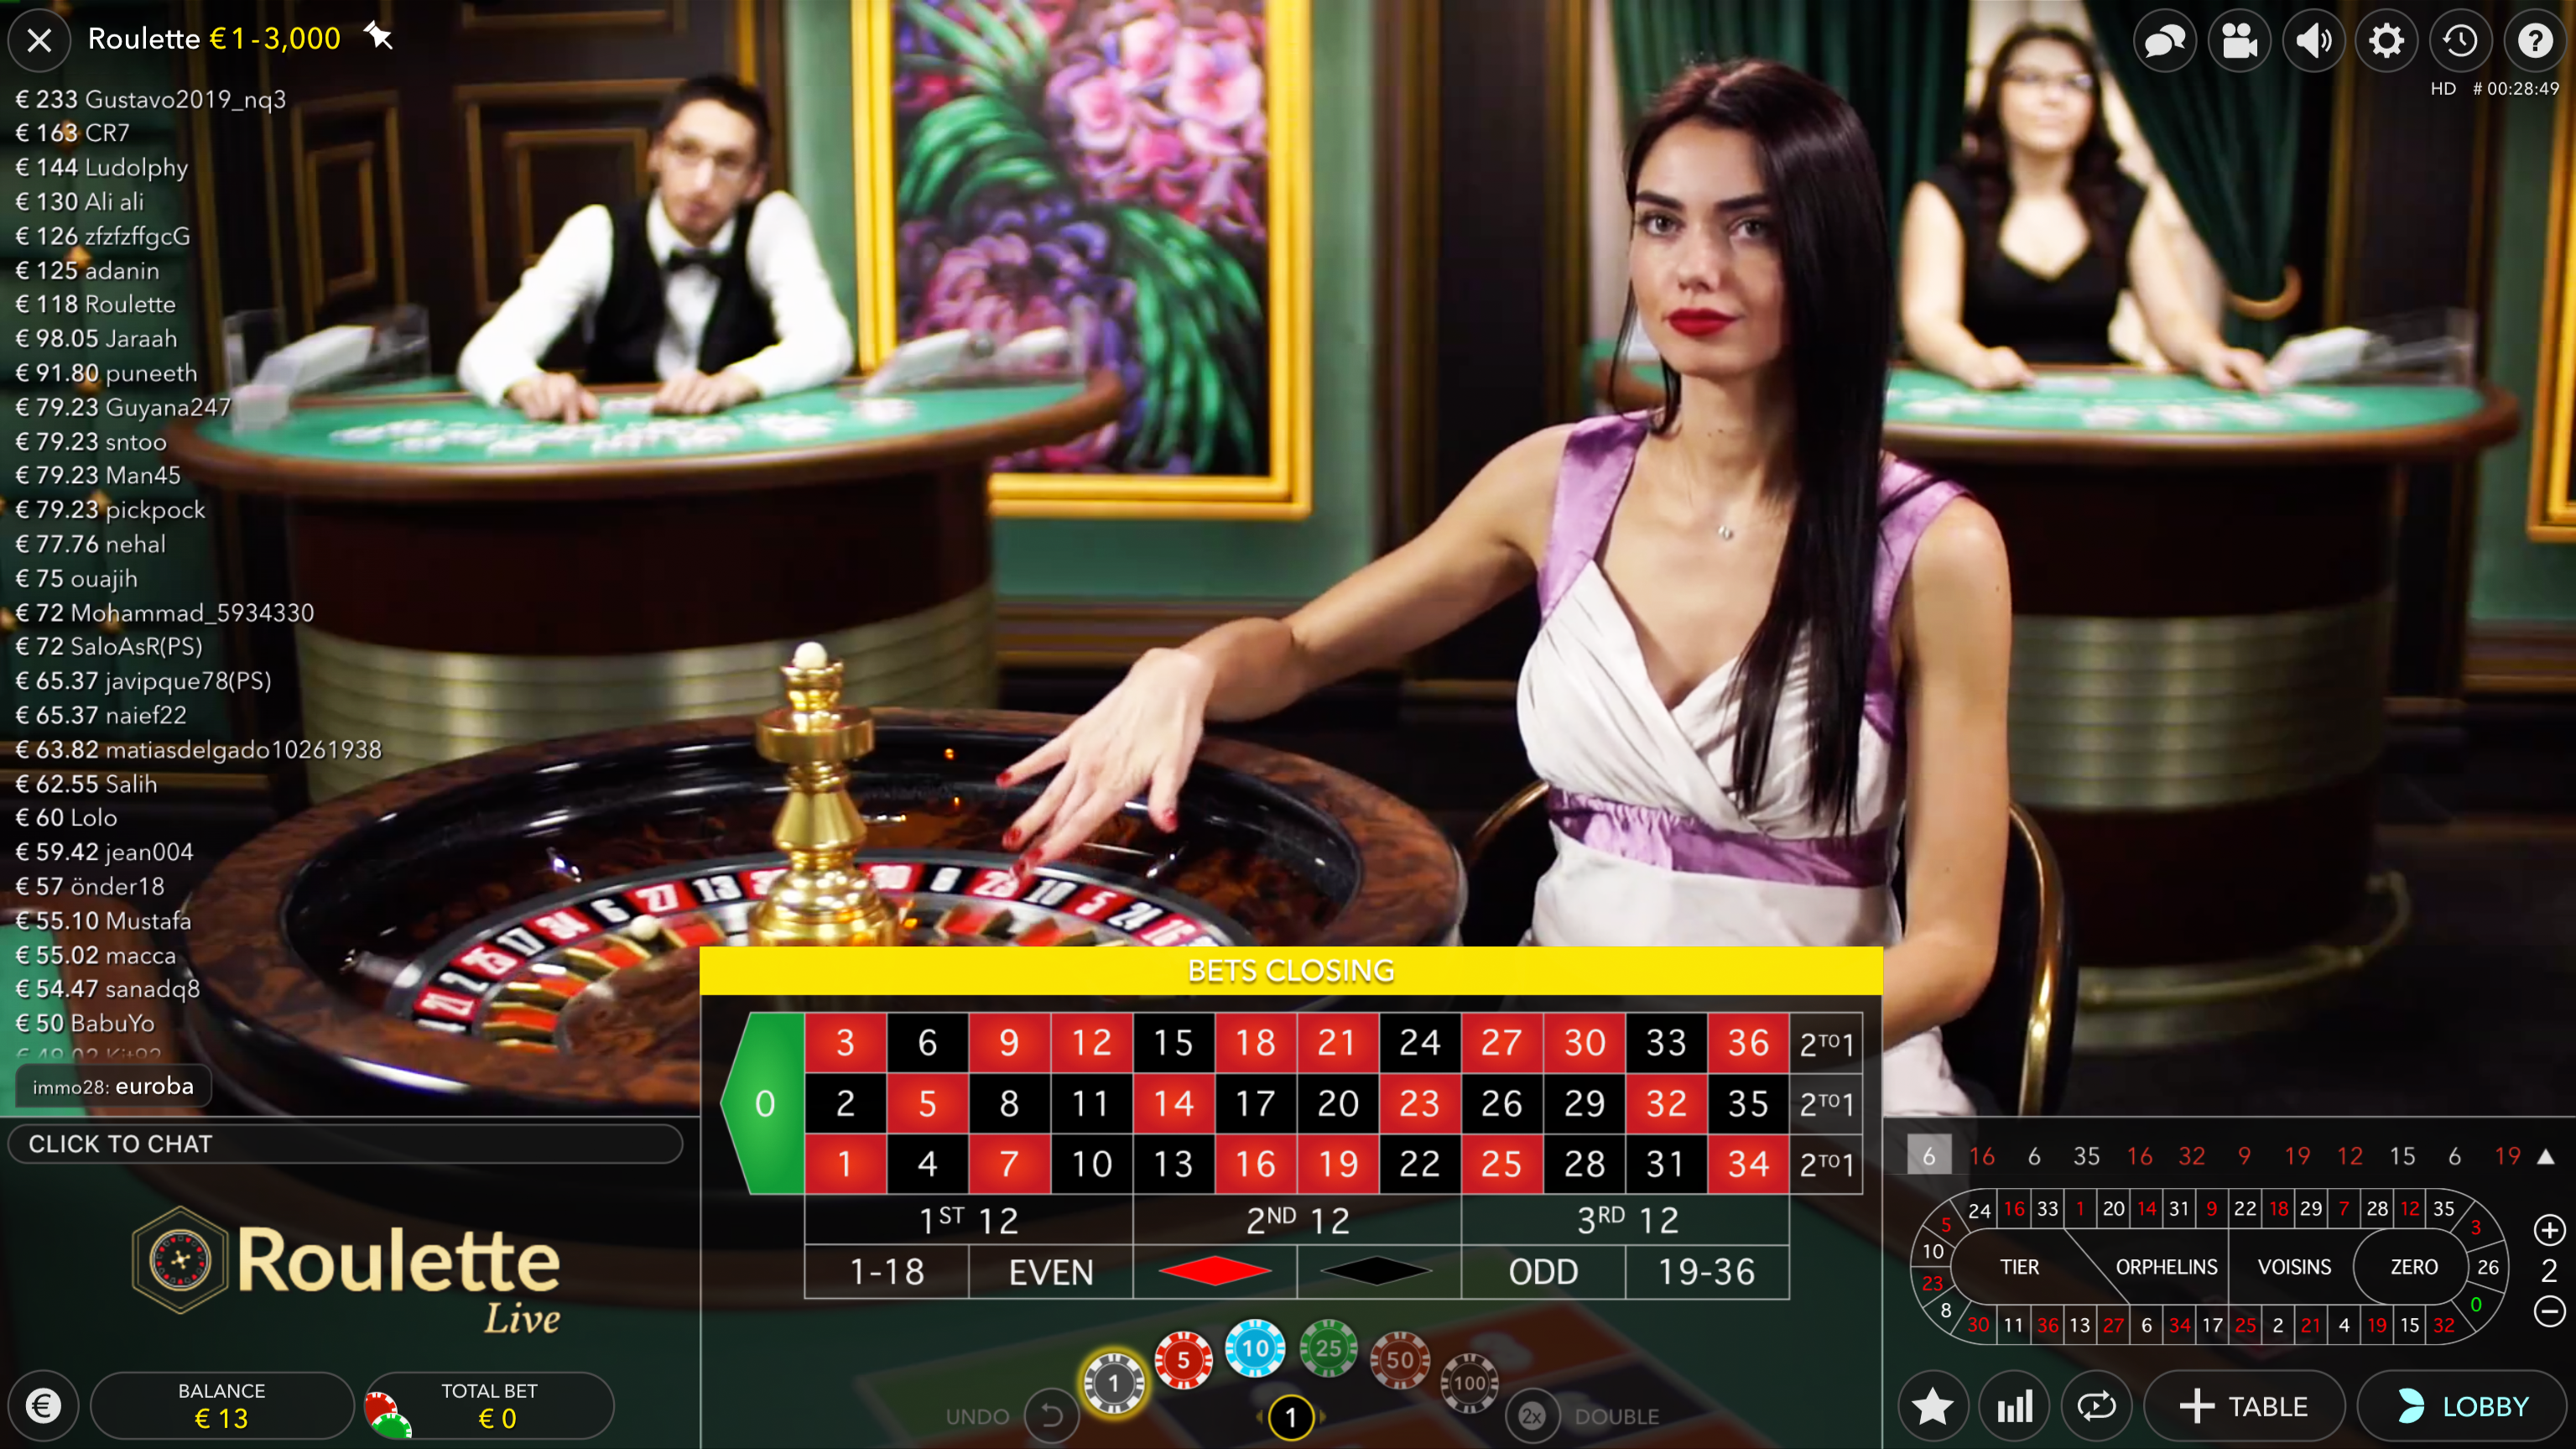 Best live online casino вулкан казино 24 отзывы